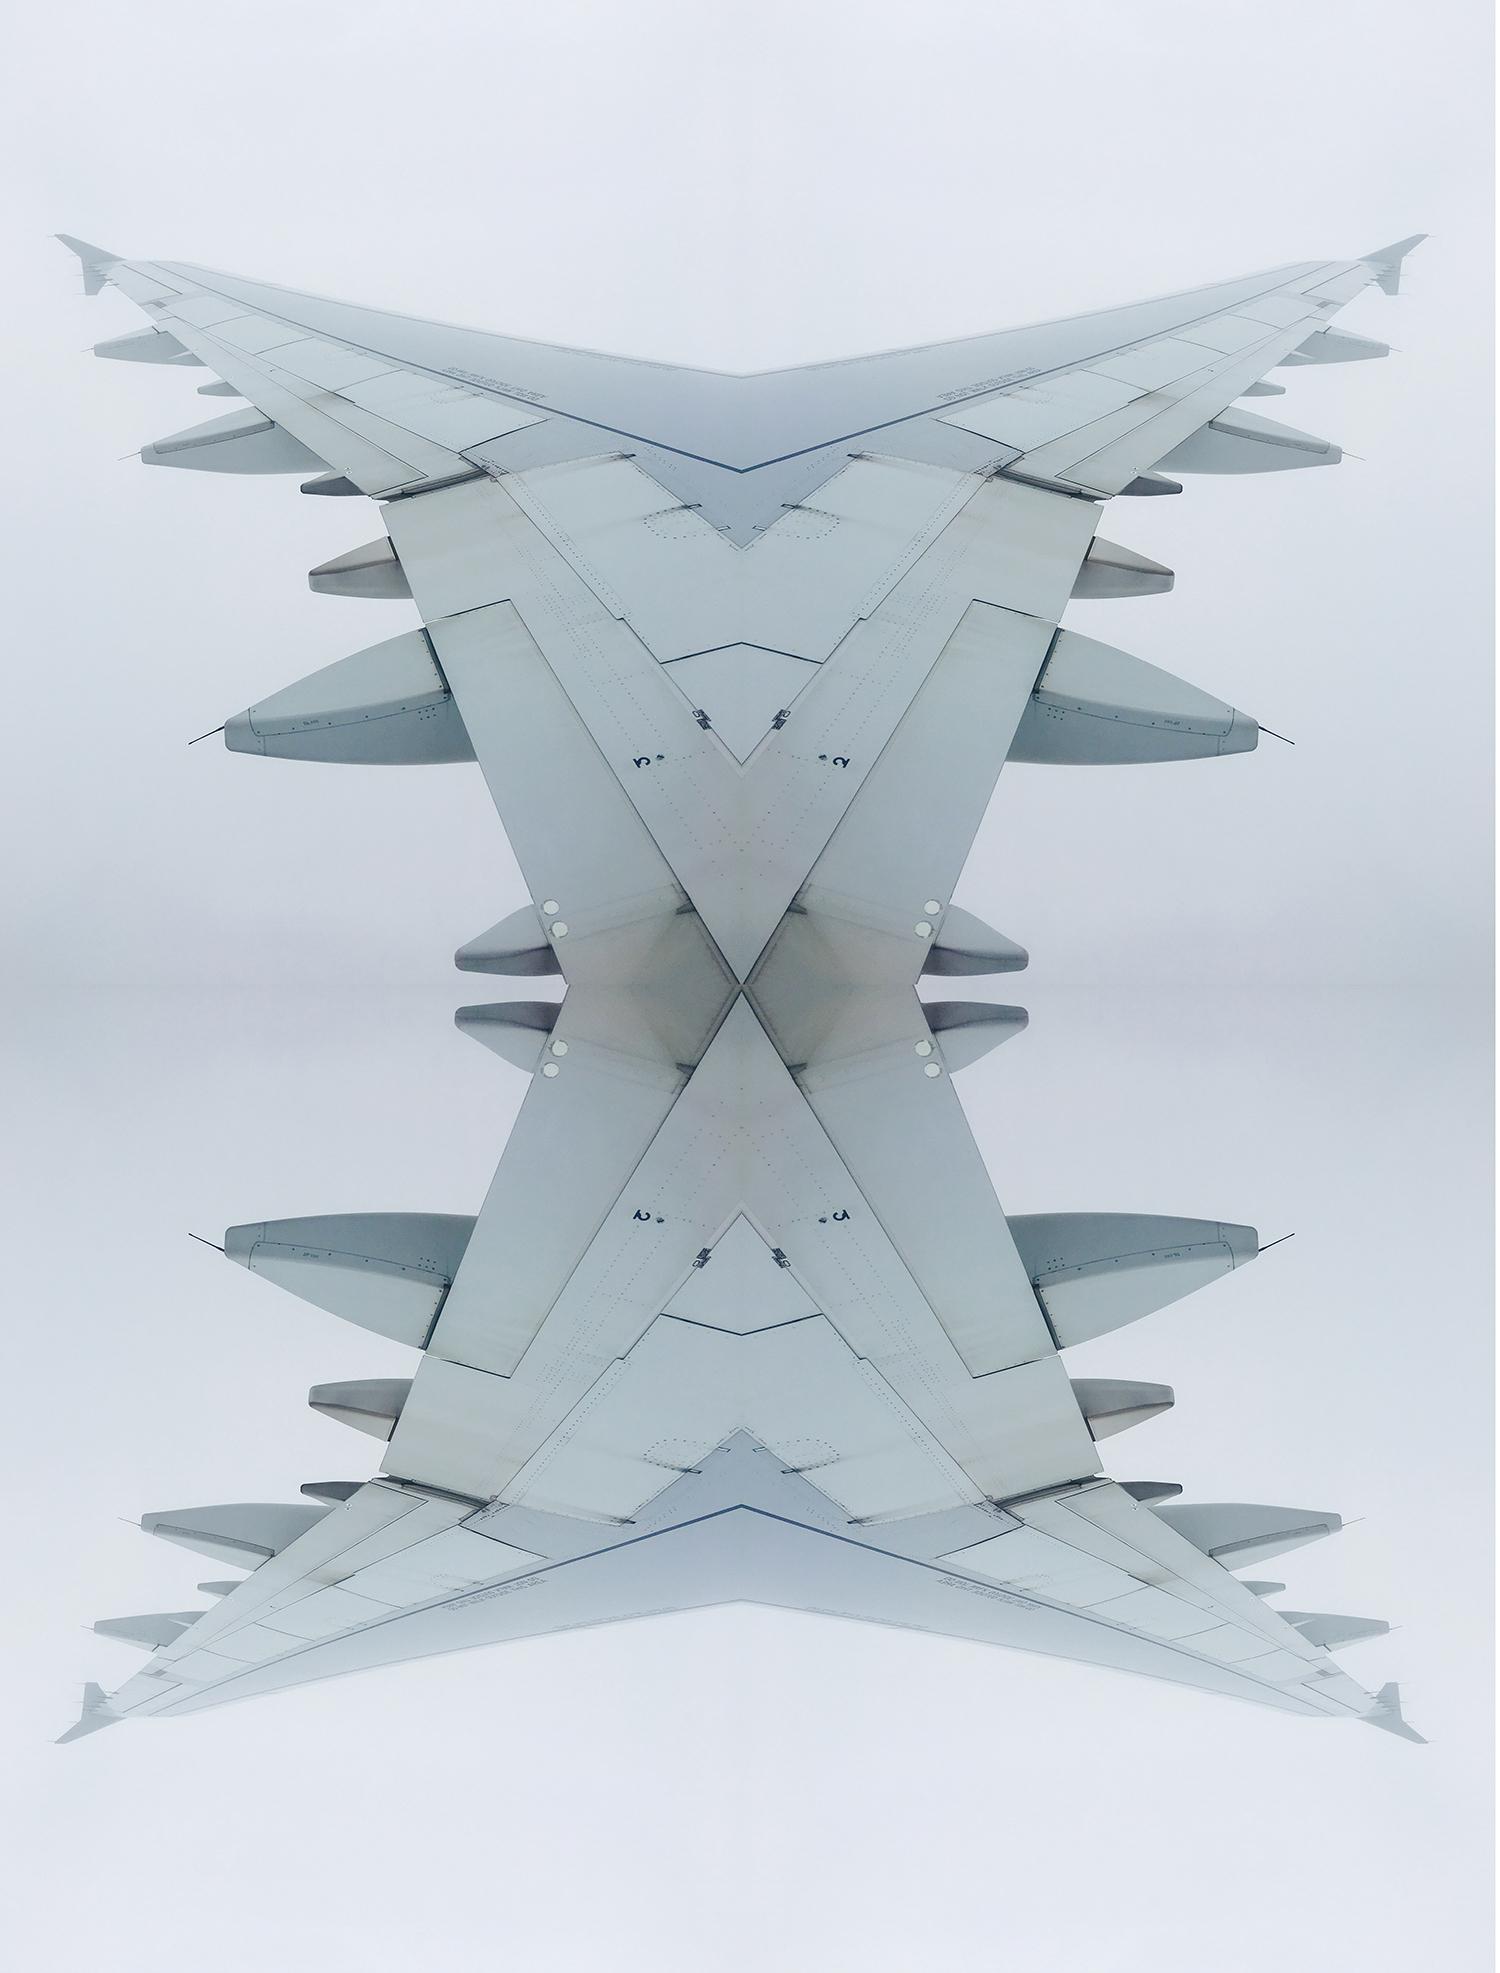 wing1.2.jpg